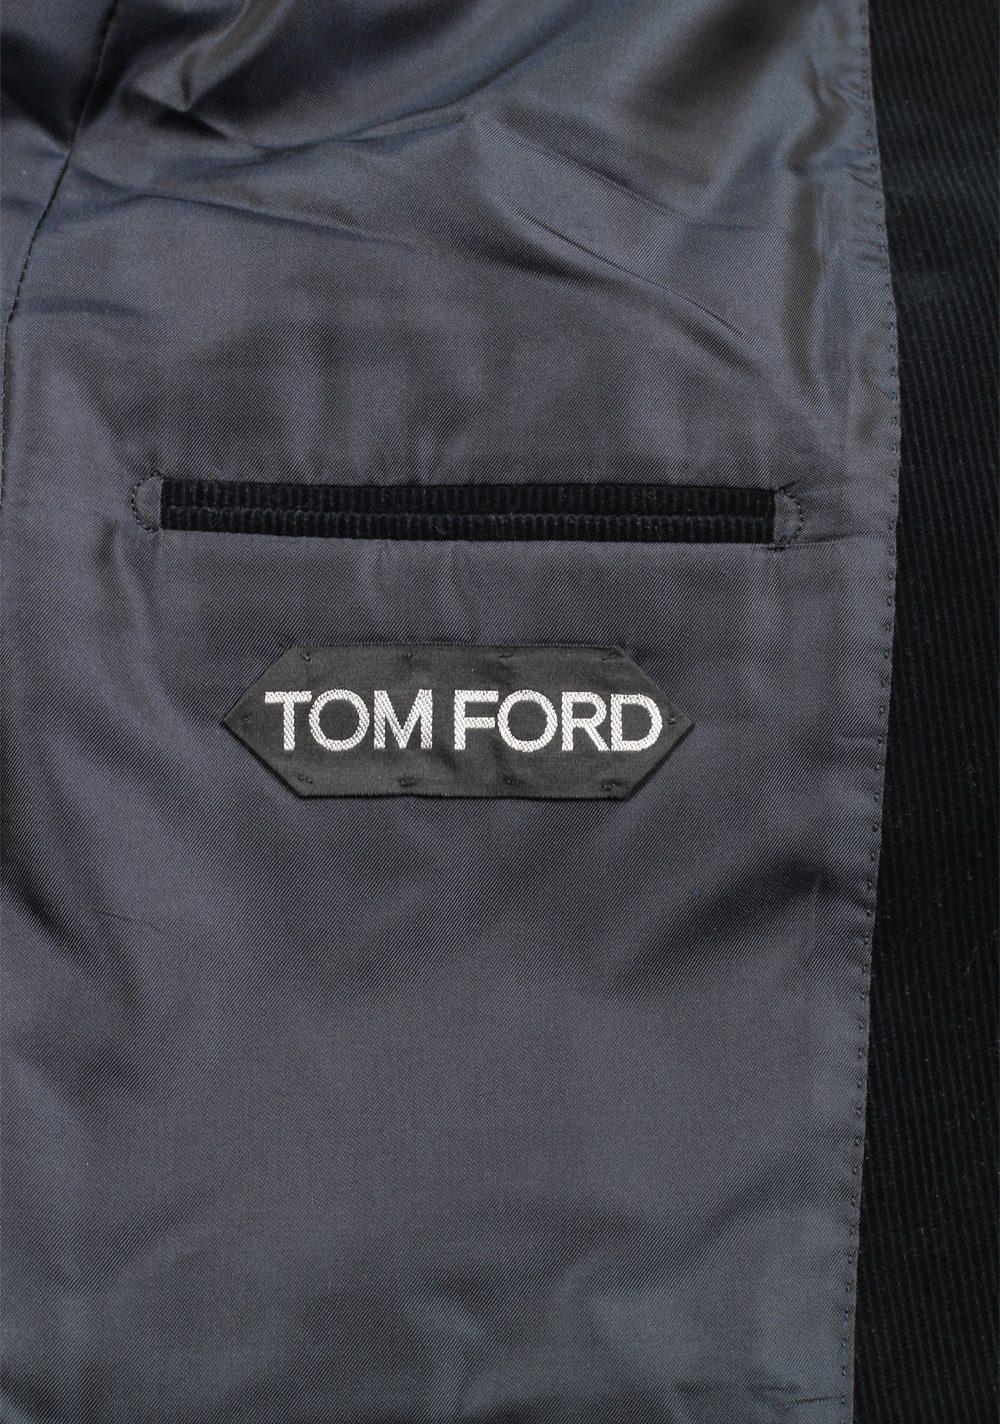 TOM FORD Shelton Greenish Blue Sport Coat Size 50 / 40R U.S. | Costume Limité